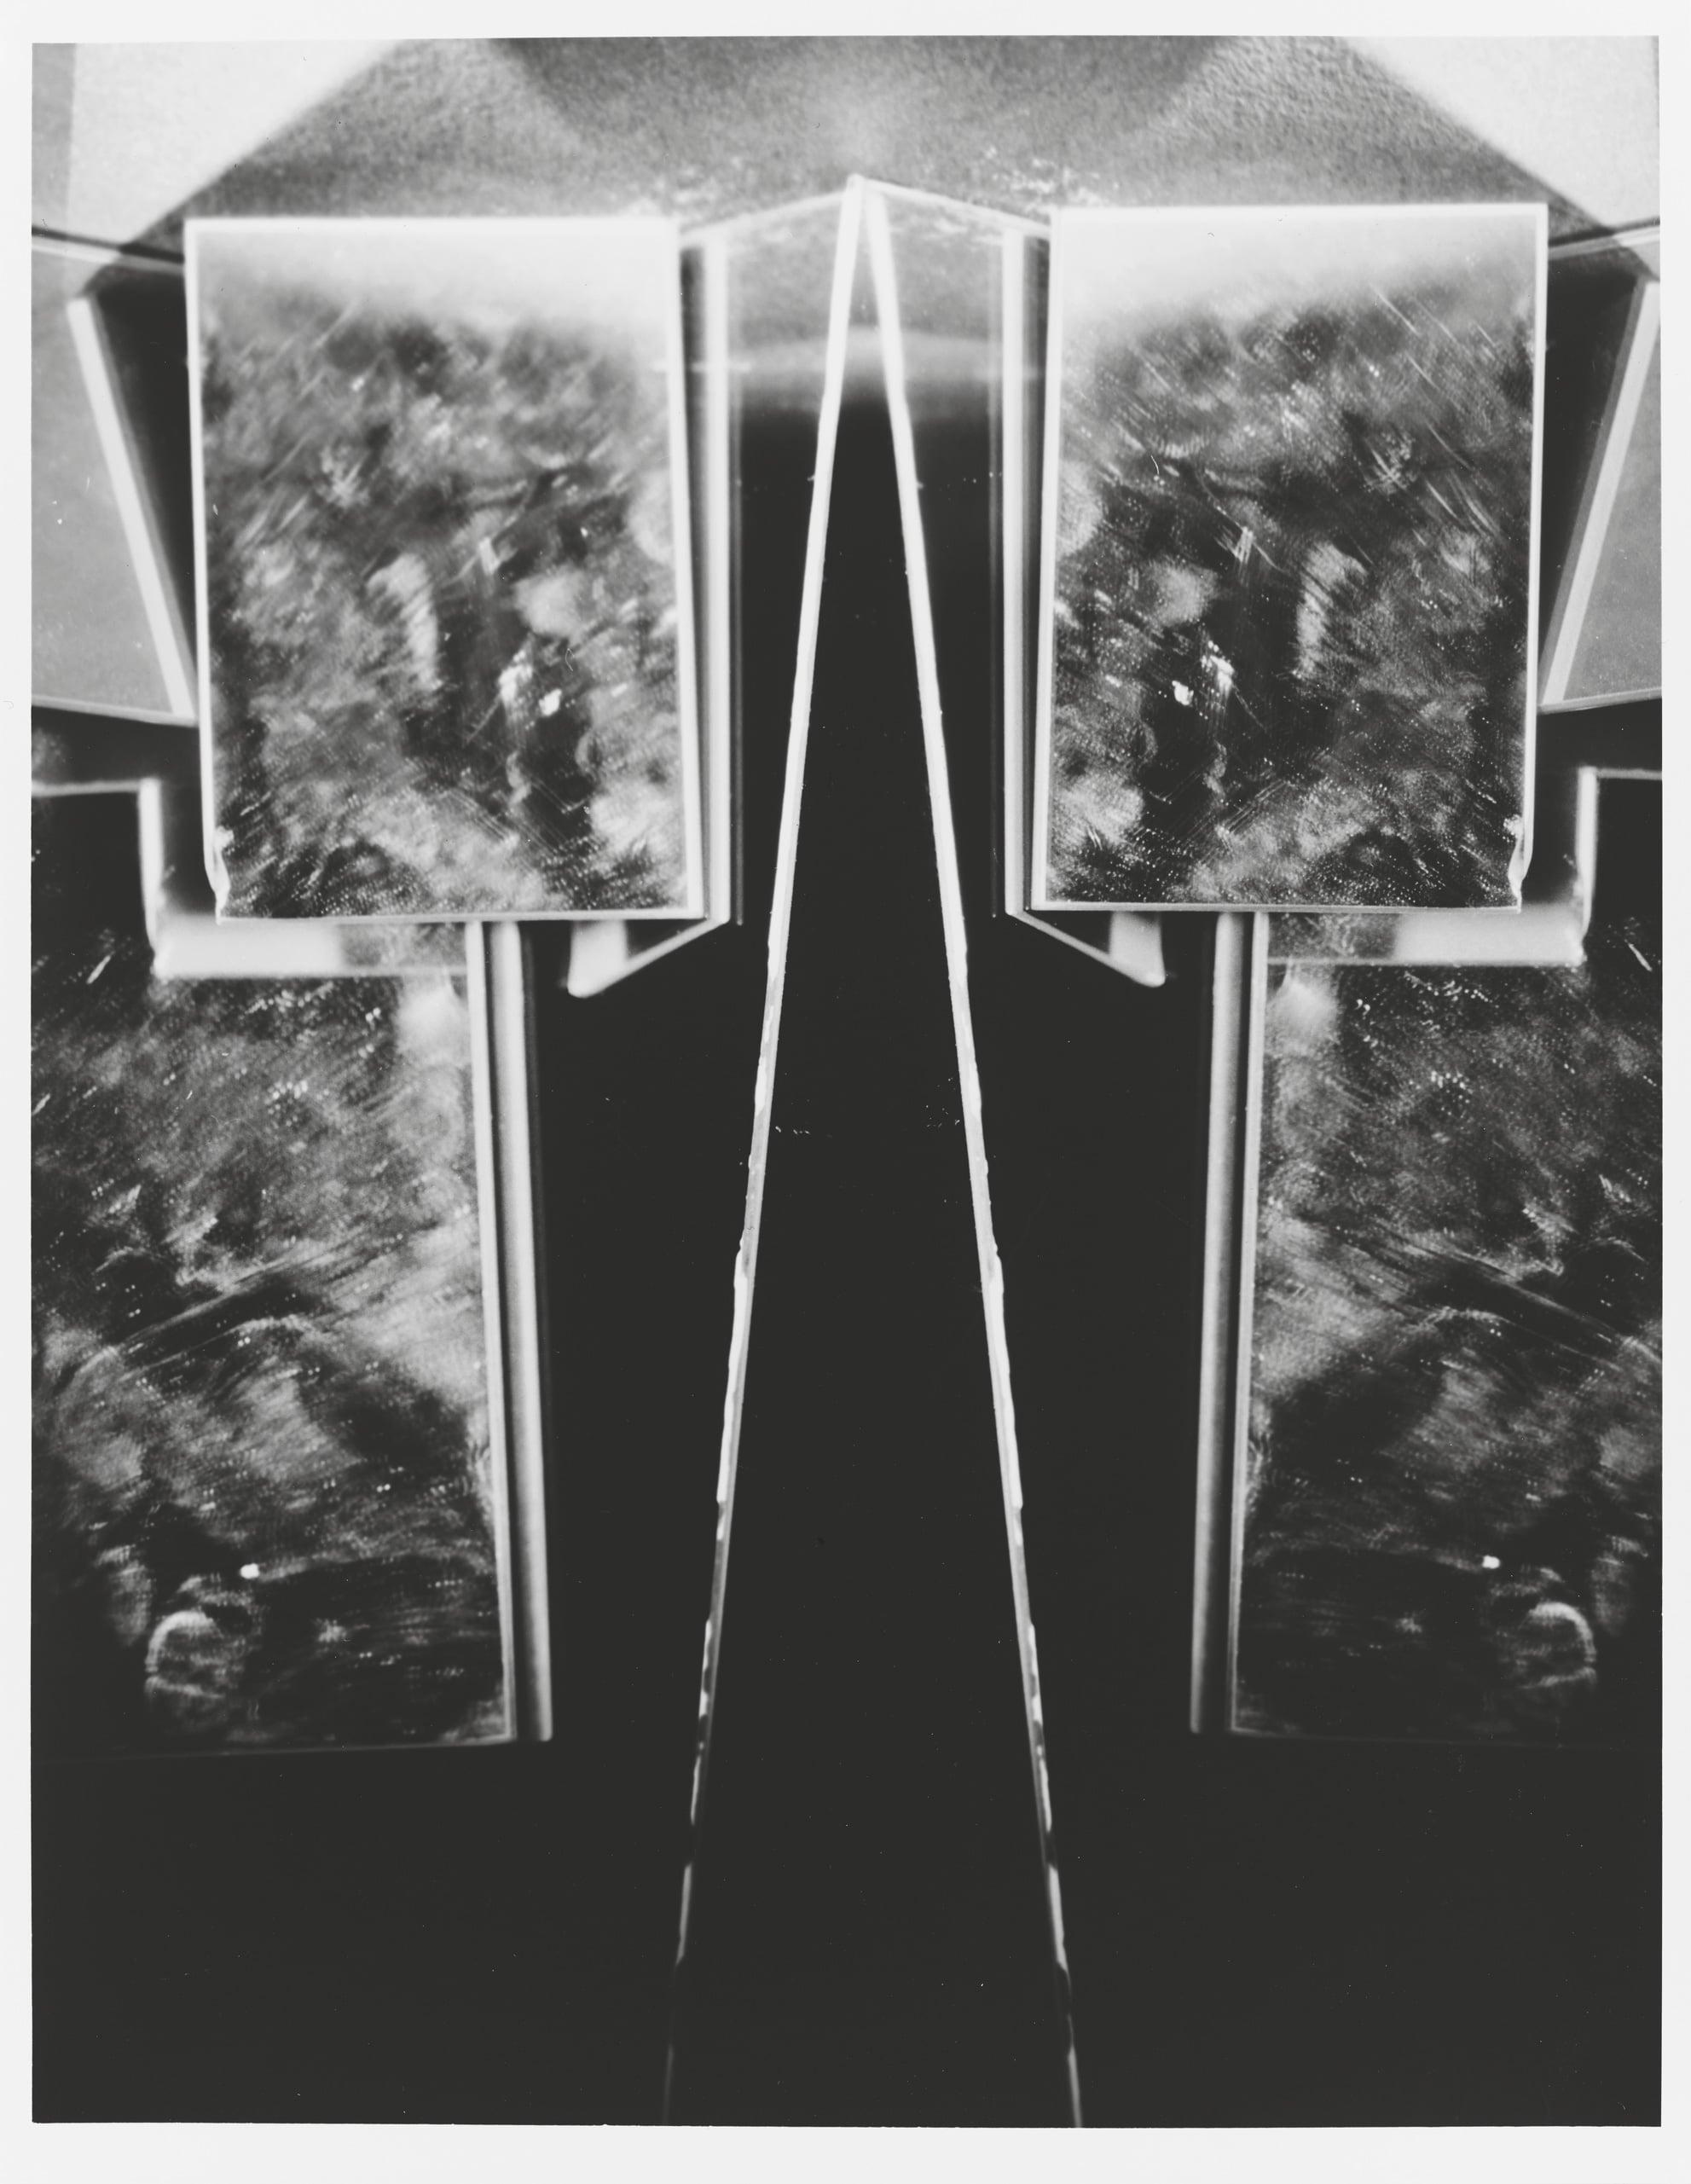 Johanna Daab | Flash of Apperance, 2017 | 60 x 80 cm, Silbergelatineabzug